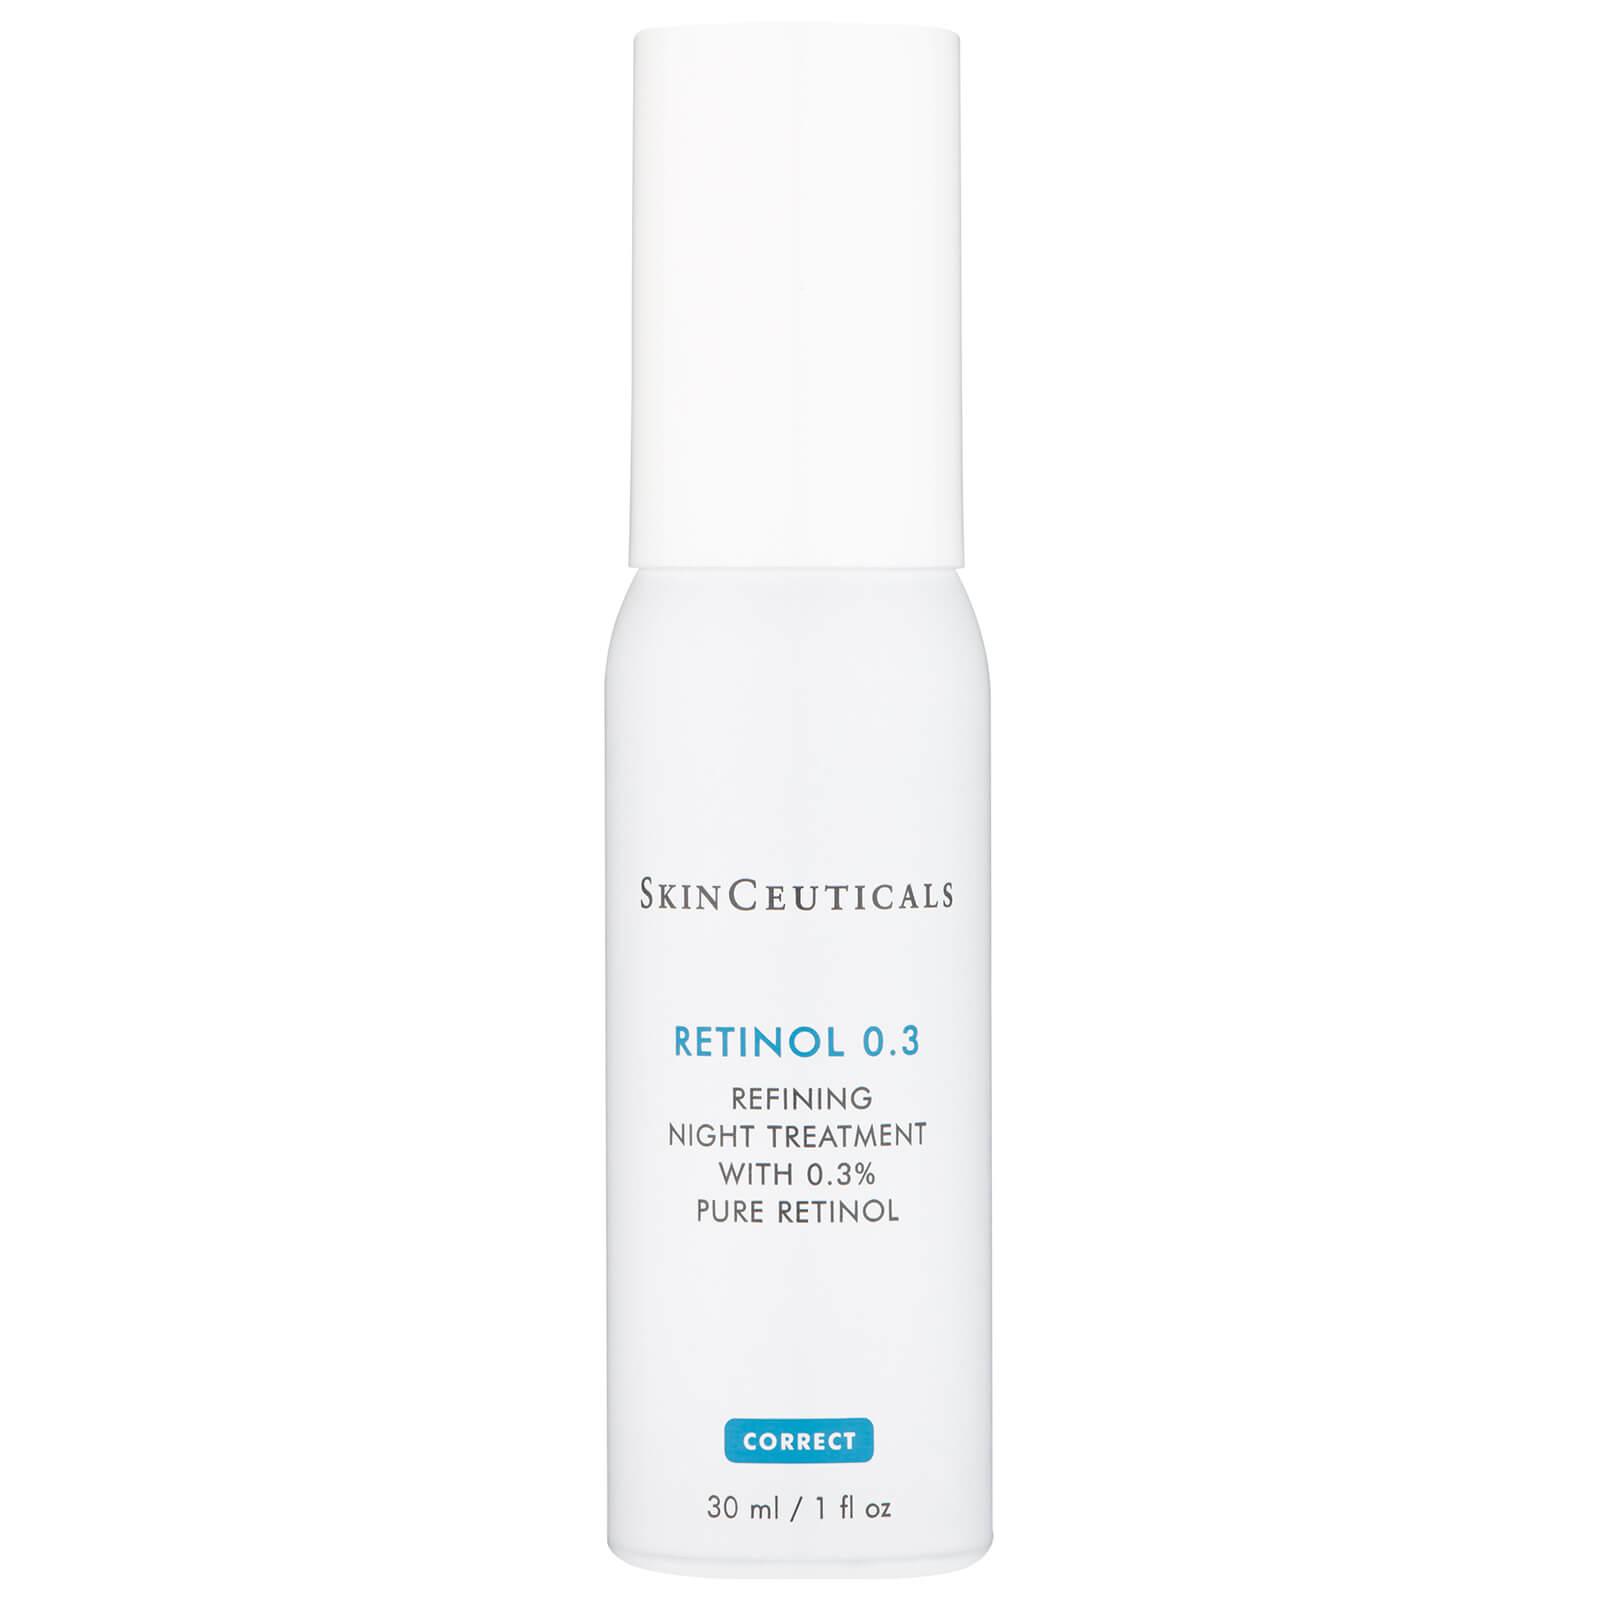 SkinCeuticals Retinol 0.3 Cream.jpg